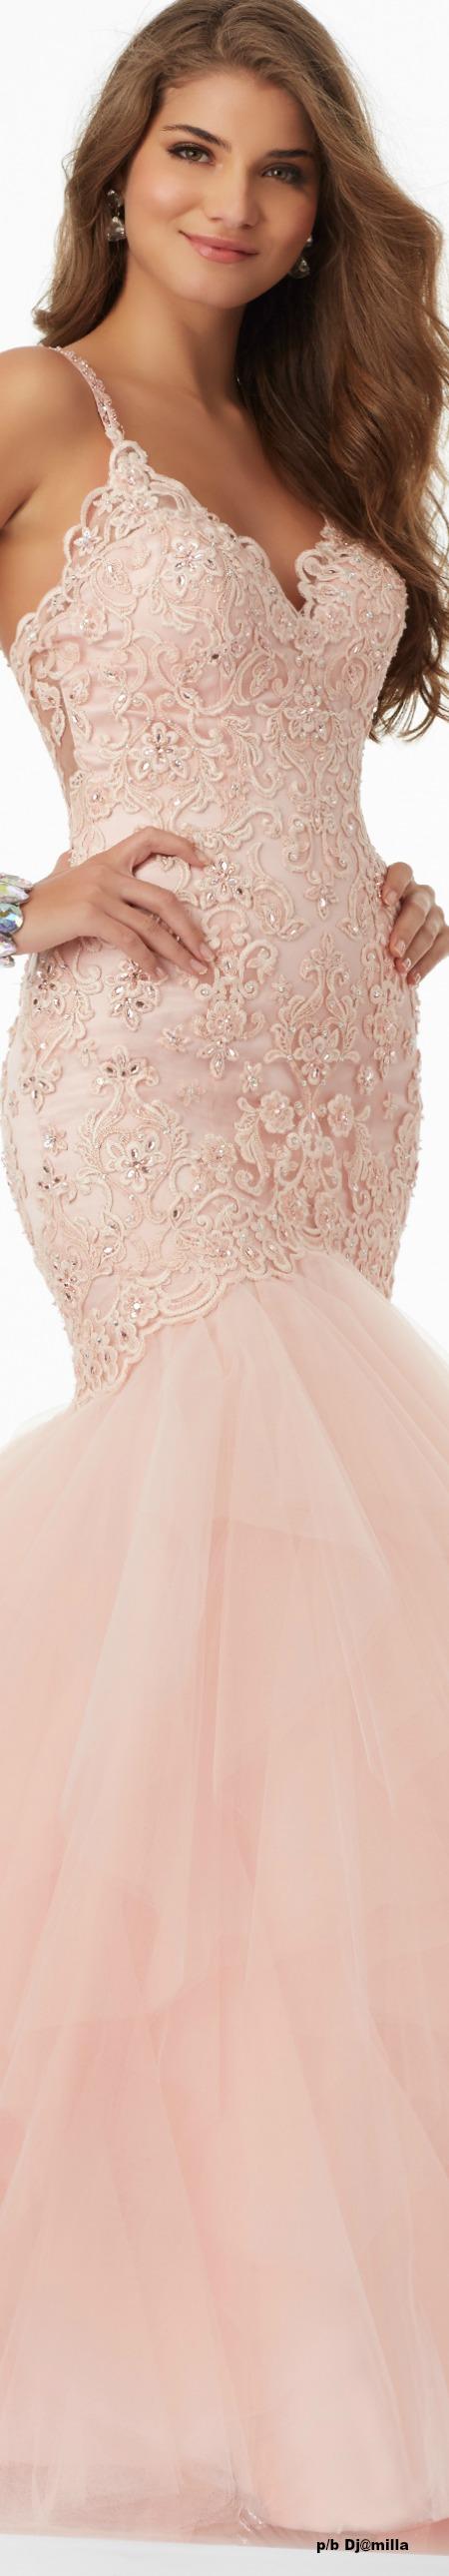 Morilee by Madeline Gardner | Moda con glamour en color rosa claro ...